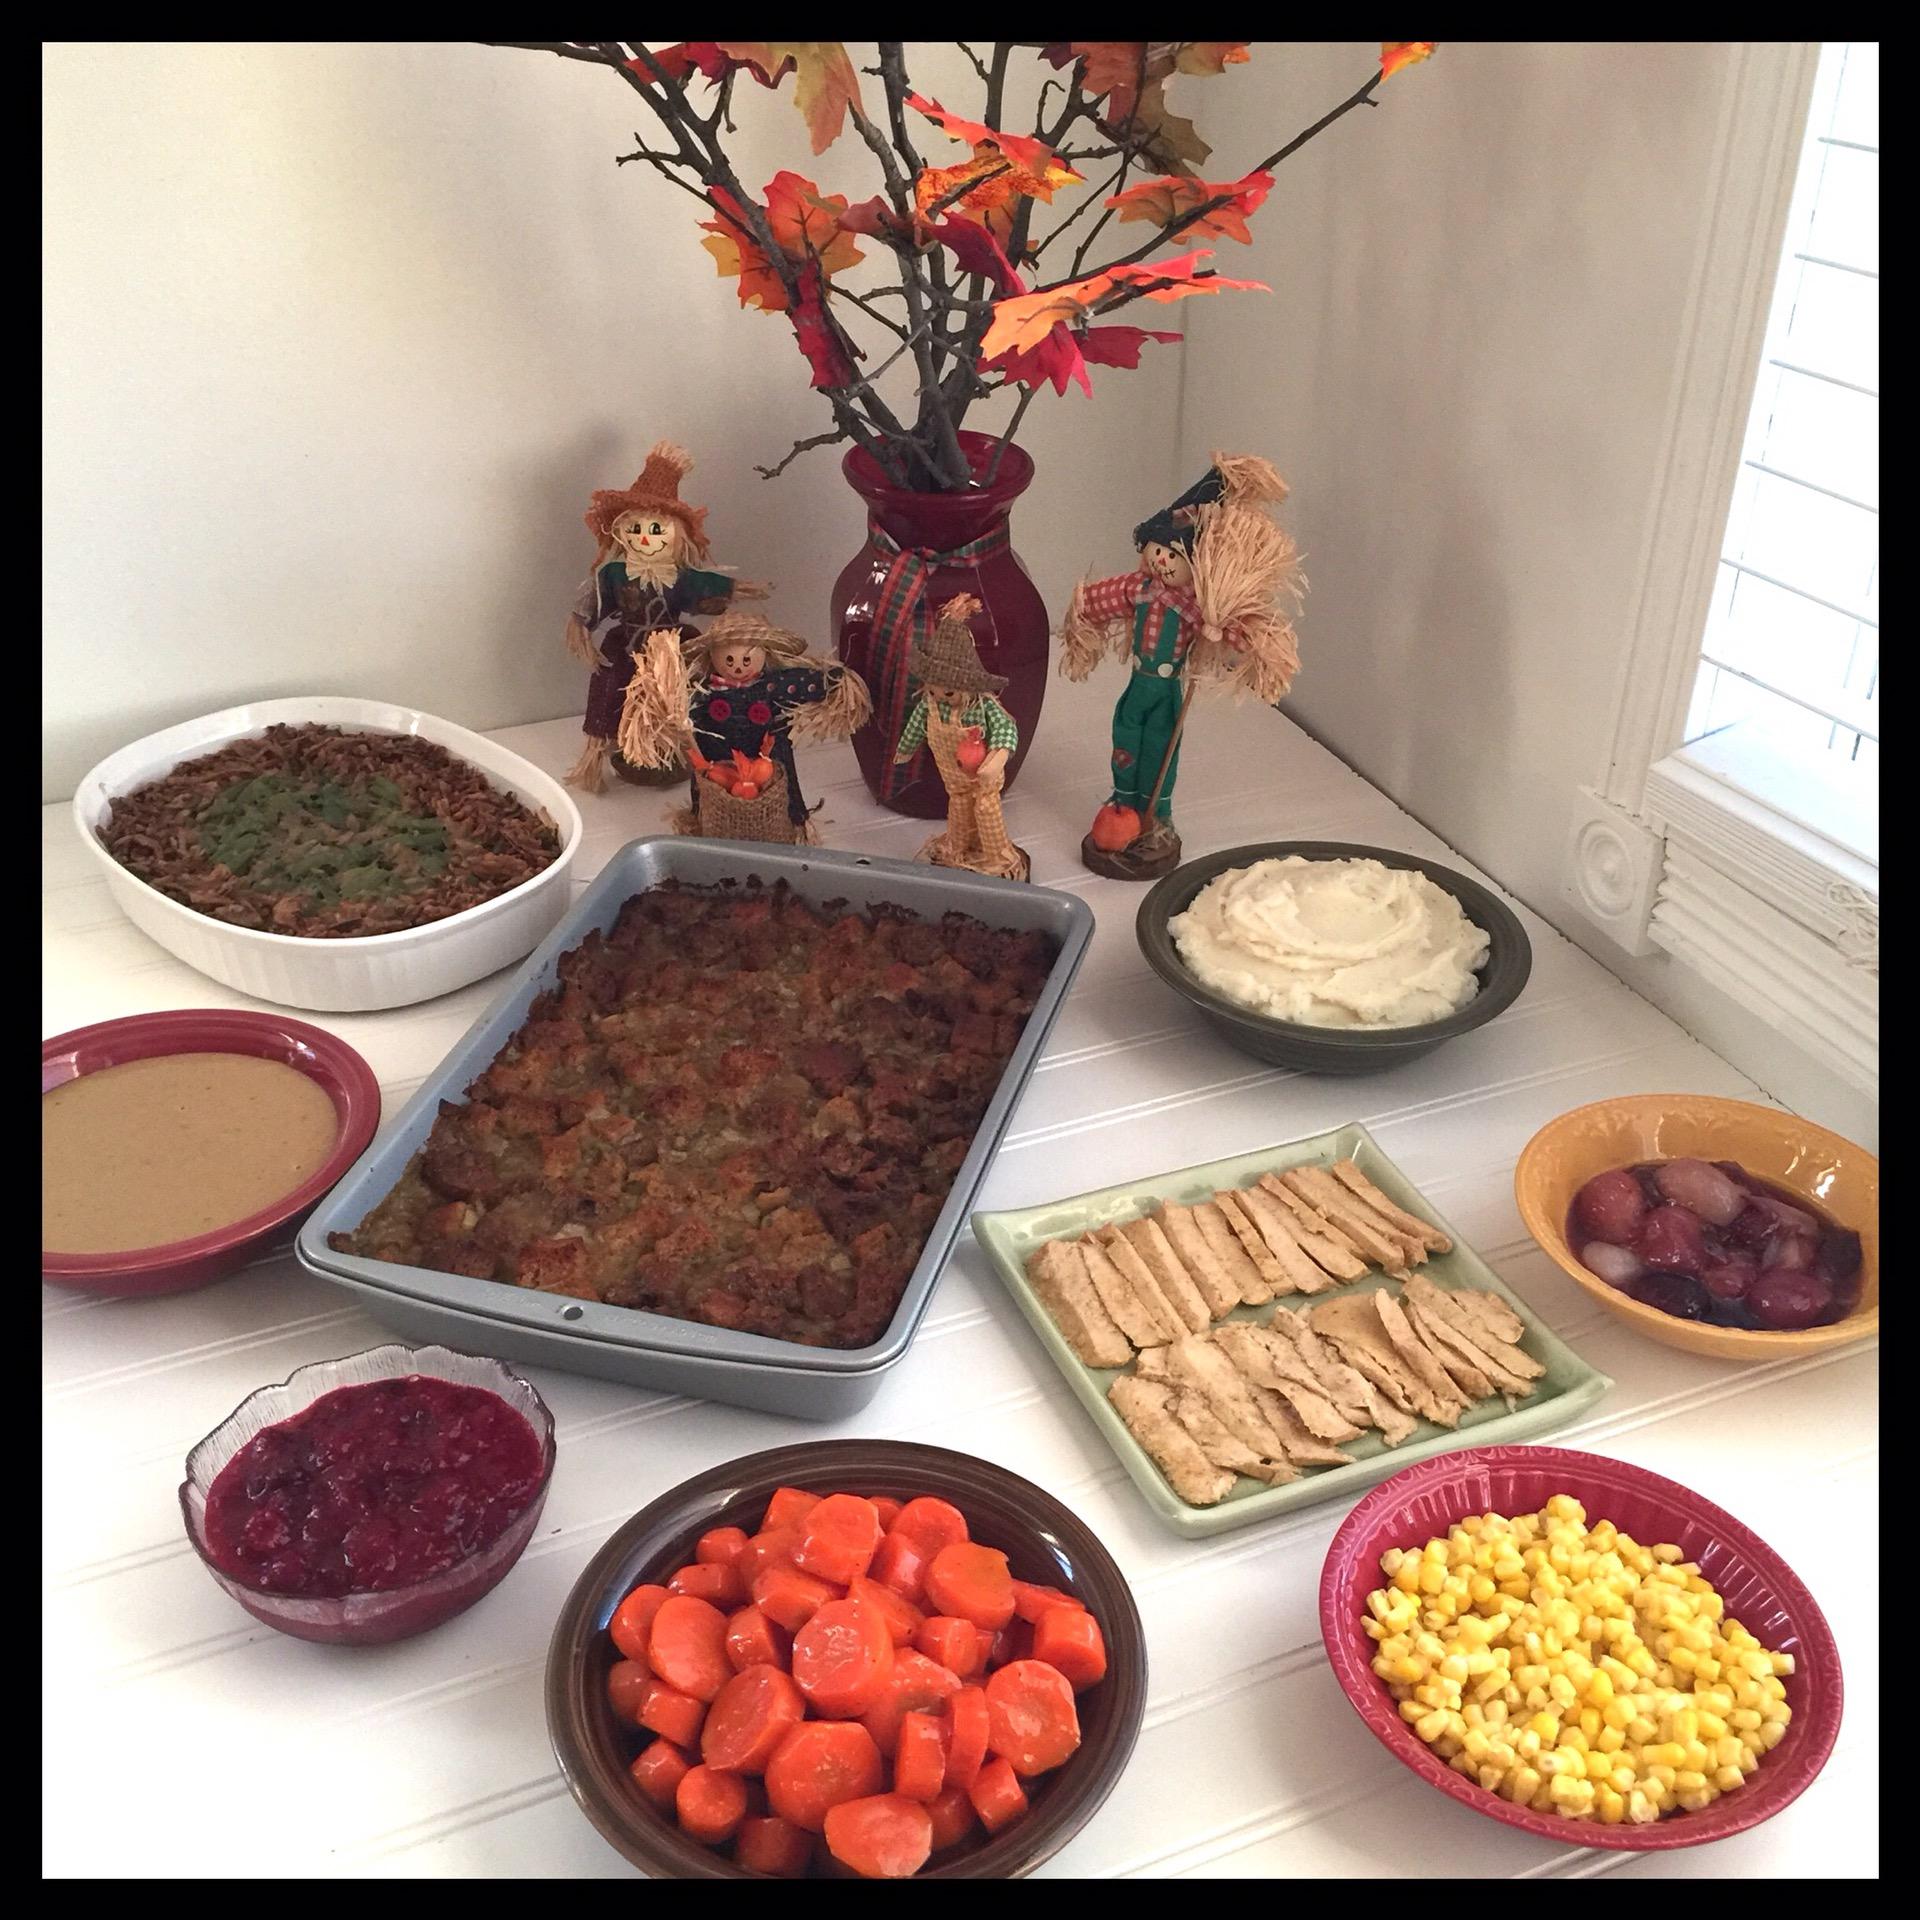 Mabon Autumnal Equinox 2017 Vegan Kitchen Magick